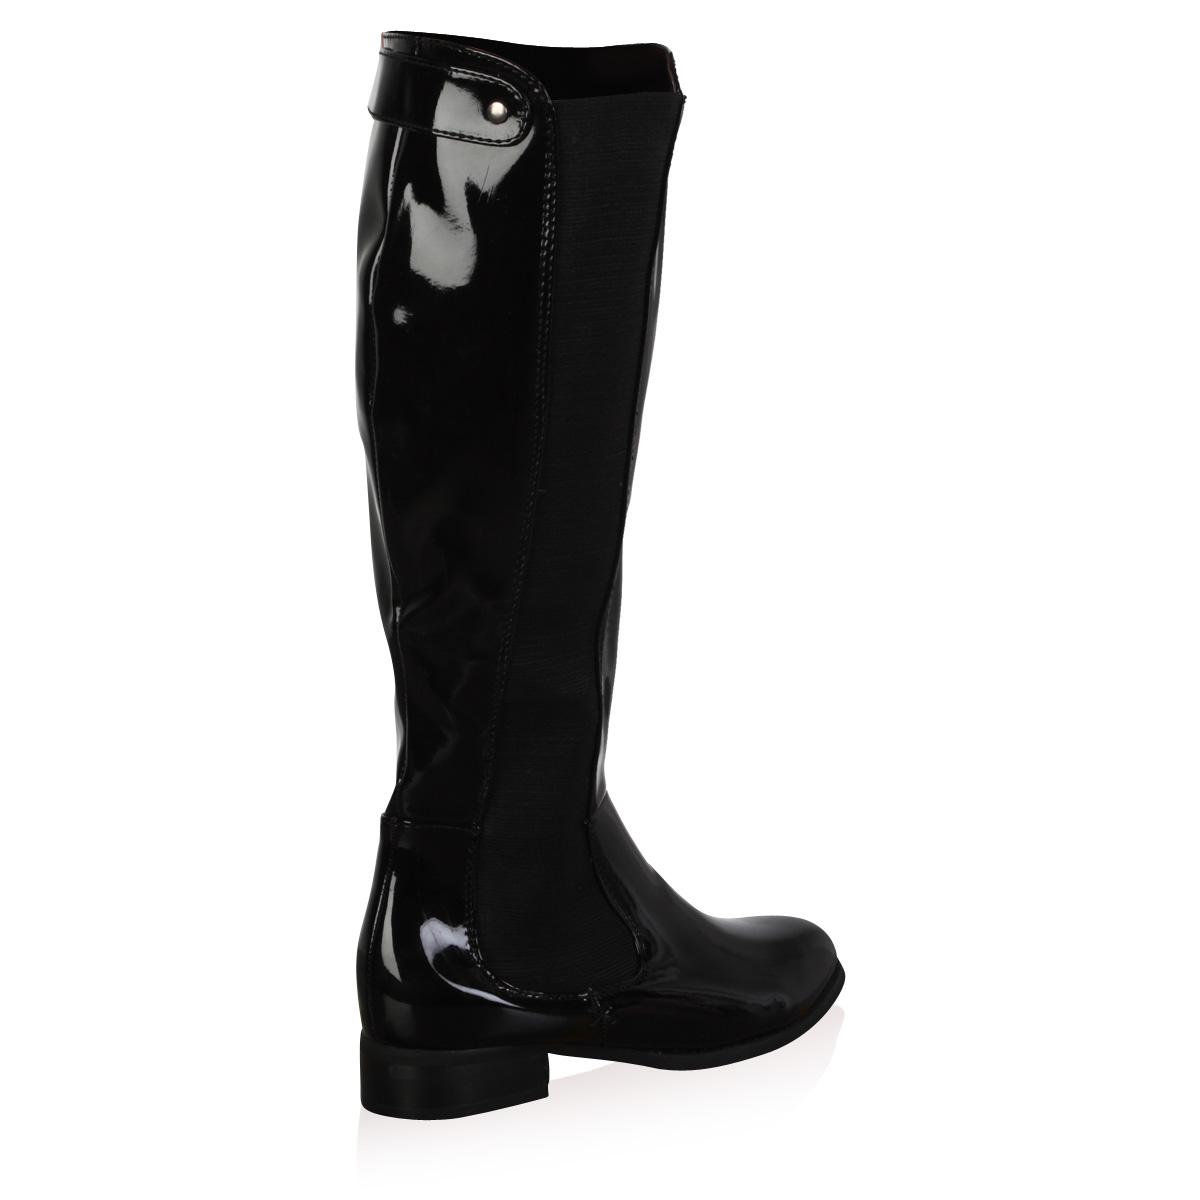 new womens black patent shiny low heel knee high